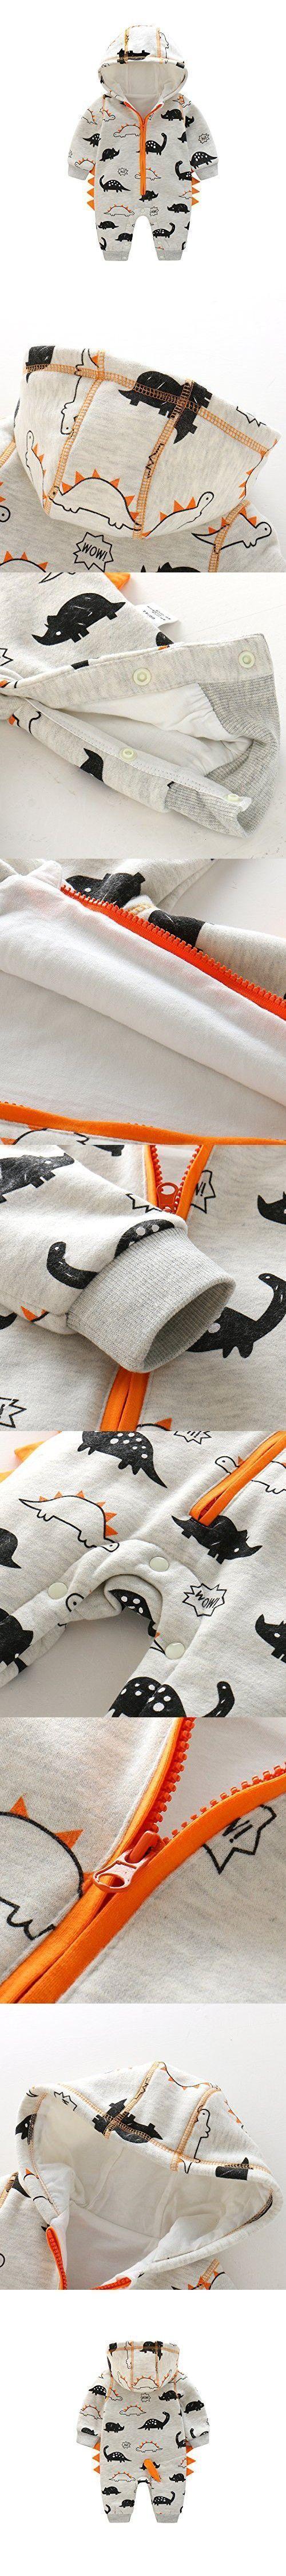 Newborn Baby Boy Baby Girl Unisex Clothes Long Sleeve Dinosaur Hoodies Winter Warm Romper outfit 3-6 months #babyboyhoodies #babygirlhoodie #babyboylongsleeve #babywinteroutfits